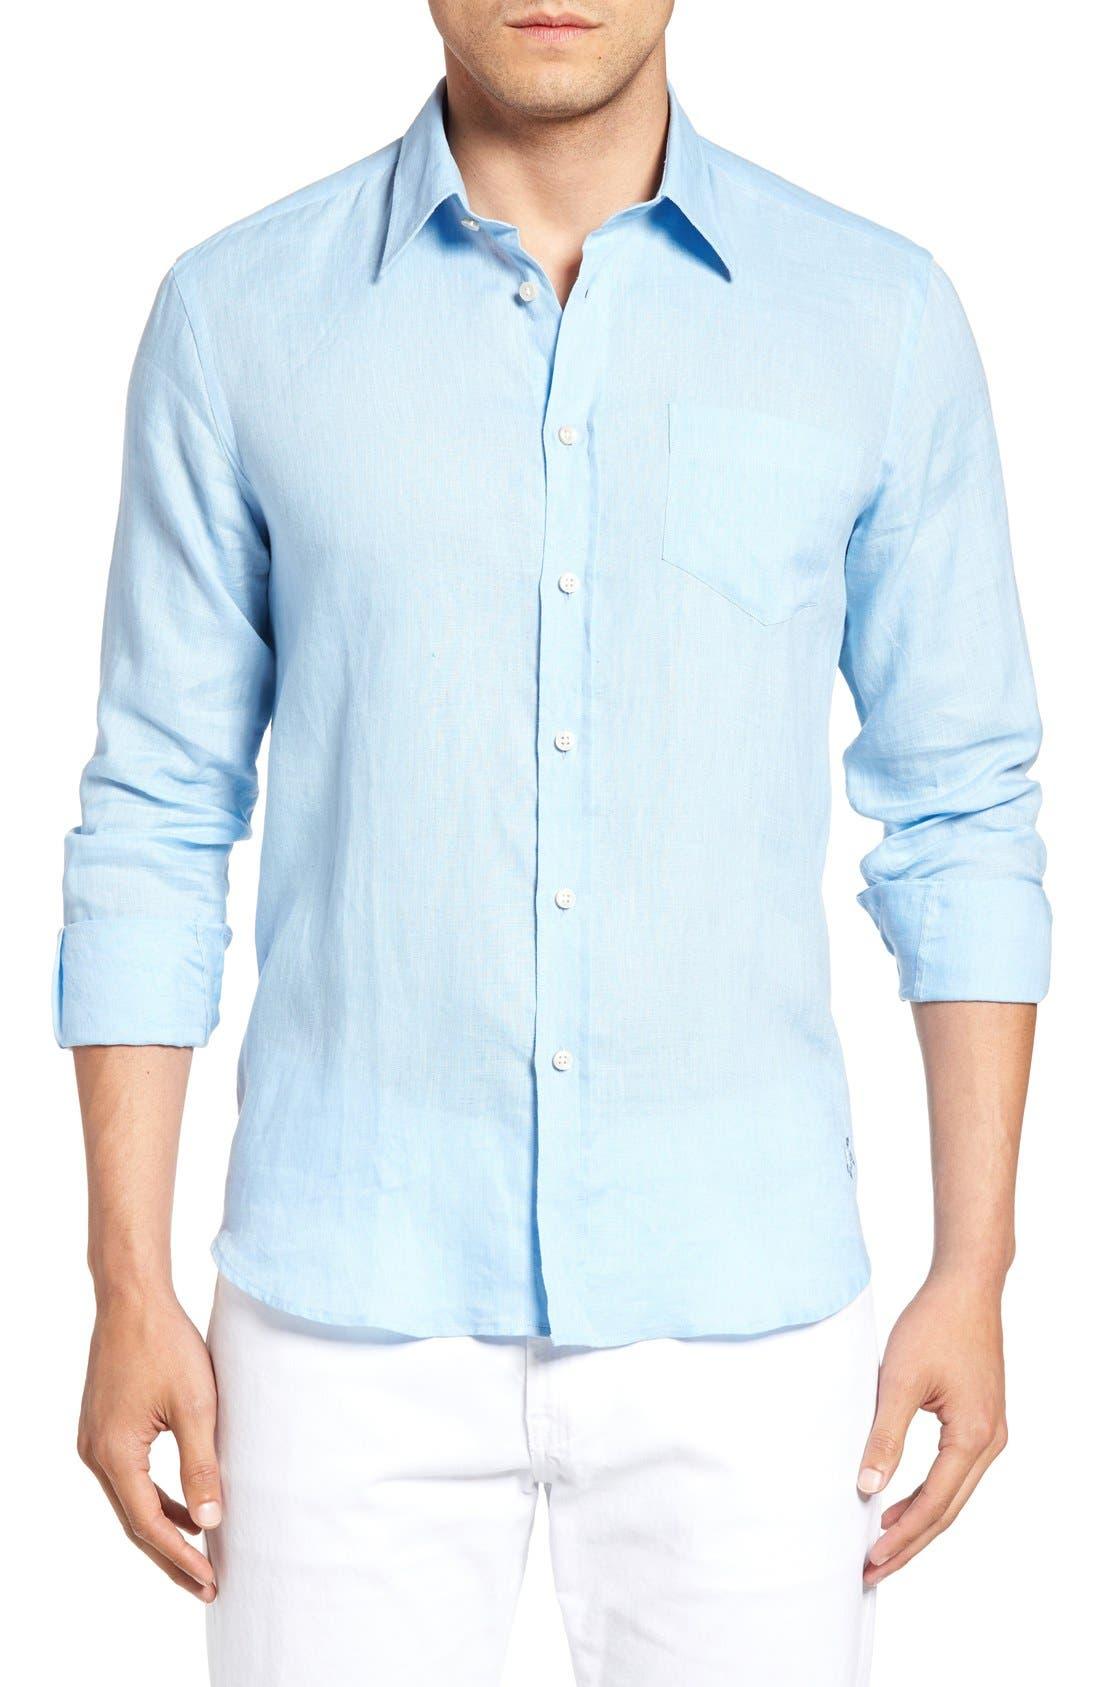 Caroubie Regular Fit Linen Sport Shirt,                             Main thumbnail 1, color,                             Sky Blue